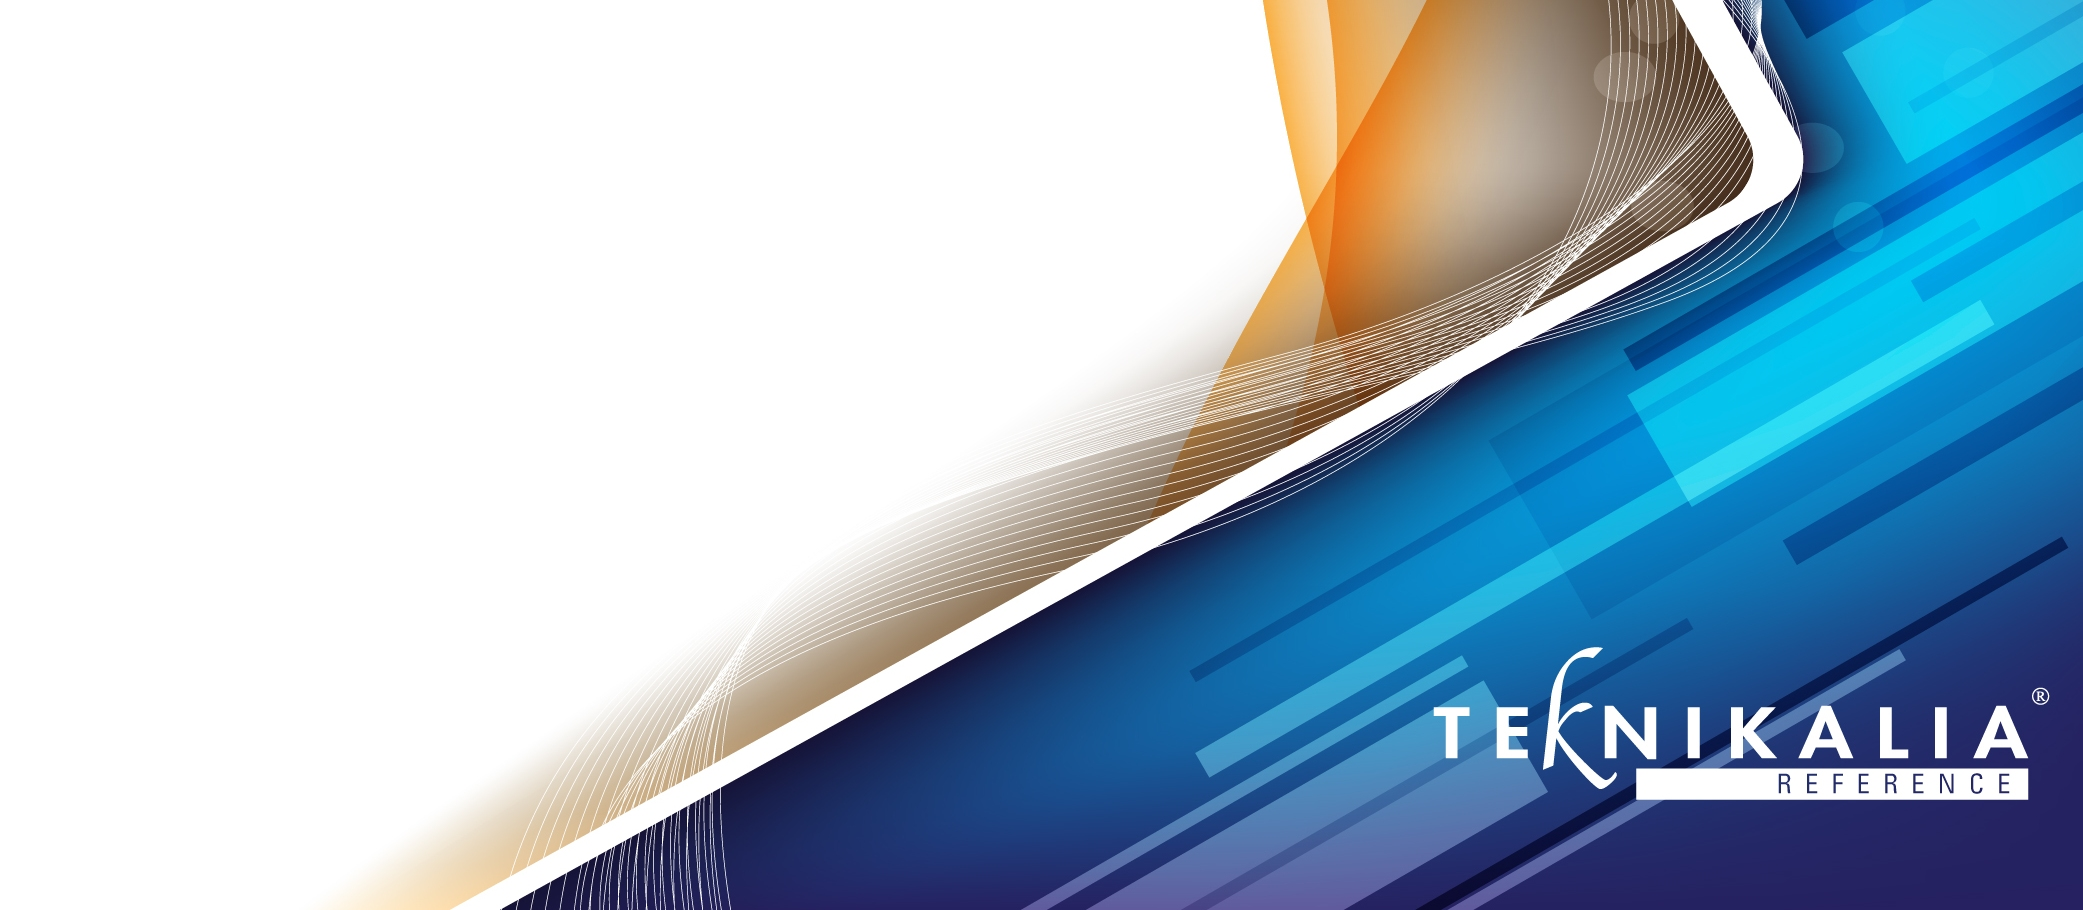 Teknikalia – Servicio técnico autorizado por fabricante